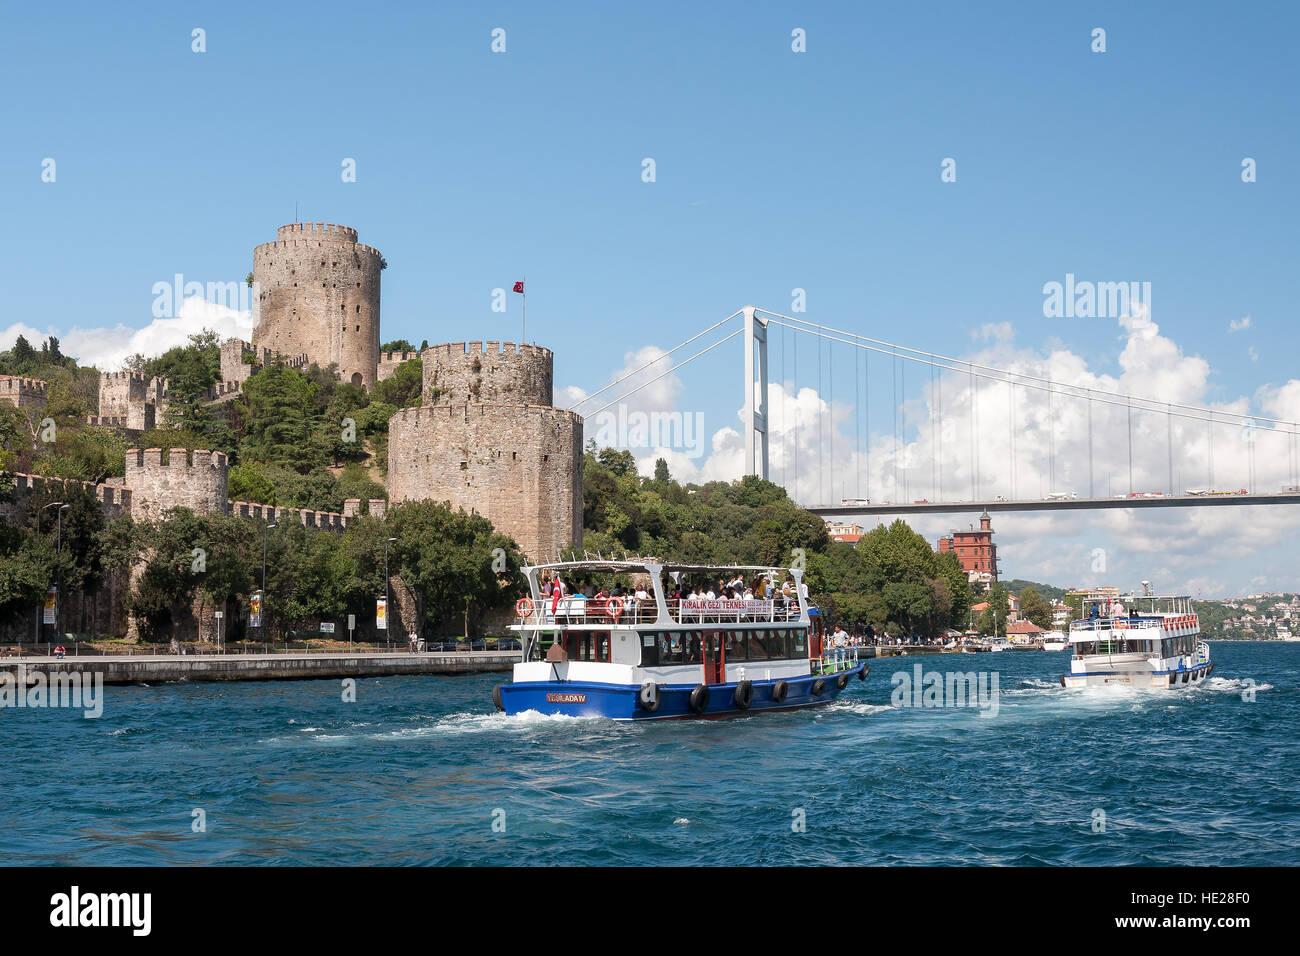 Cruise ships at Bosporus strait with Fatih Sultan Mehmet Bridge and Fortress Rumeli Hisari, Istanbul, Turkey, middle - Stock Image